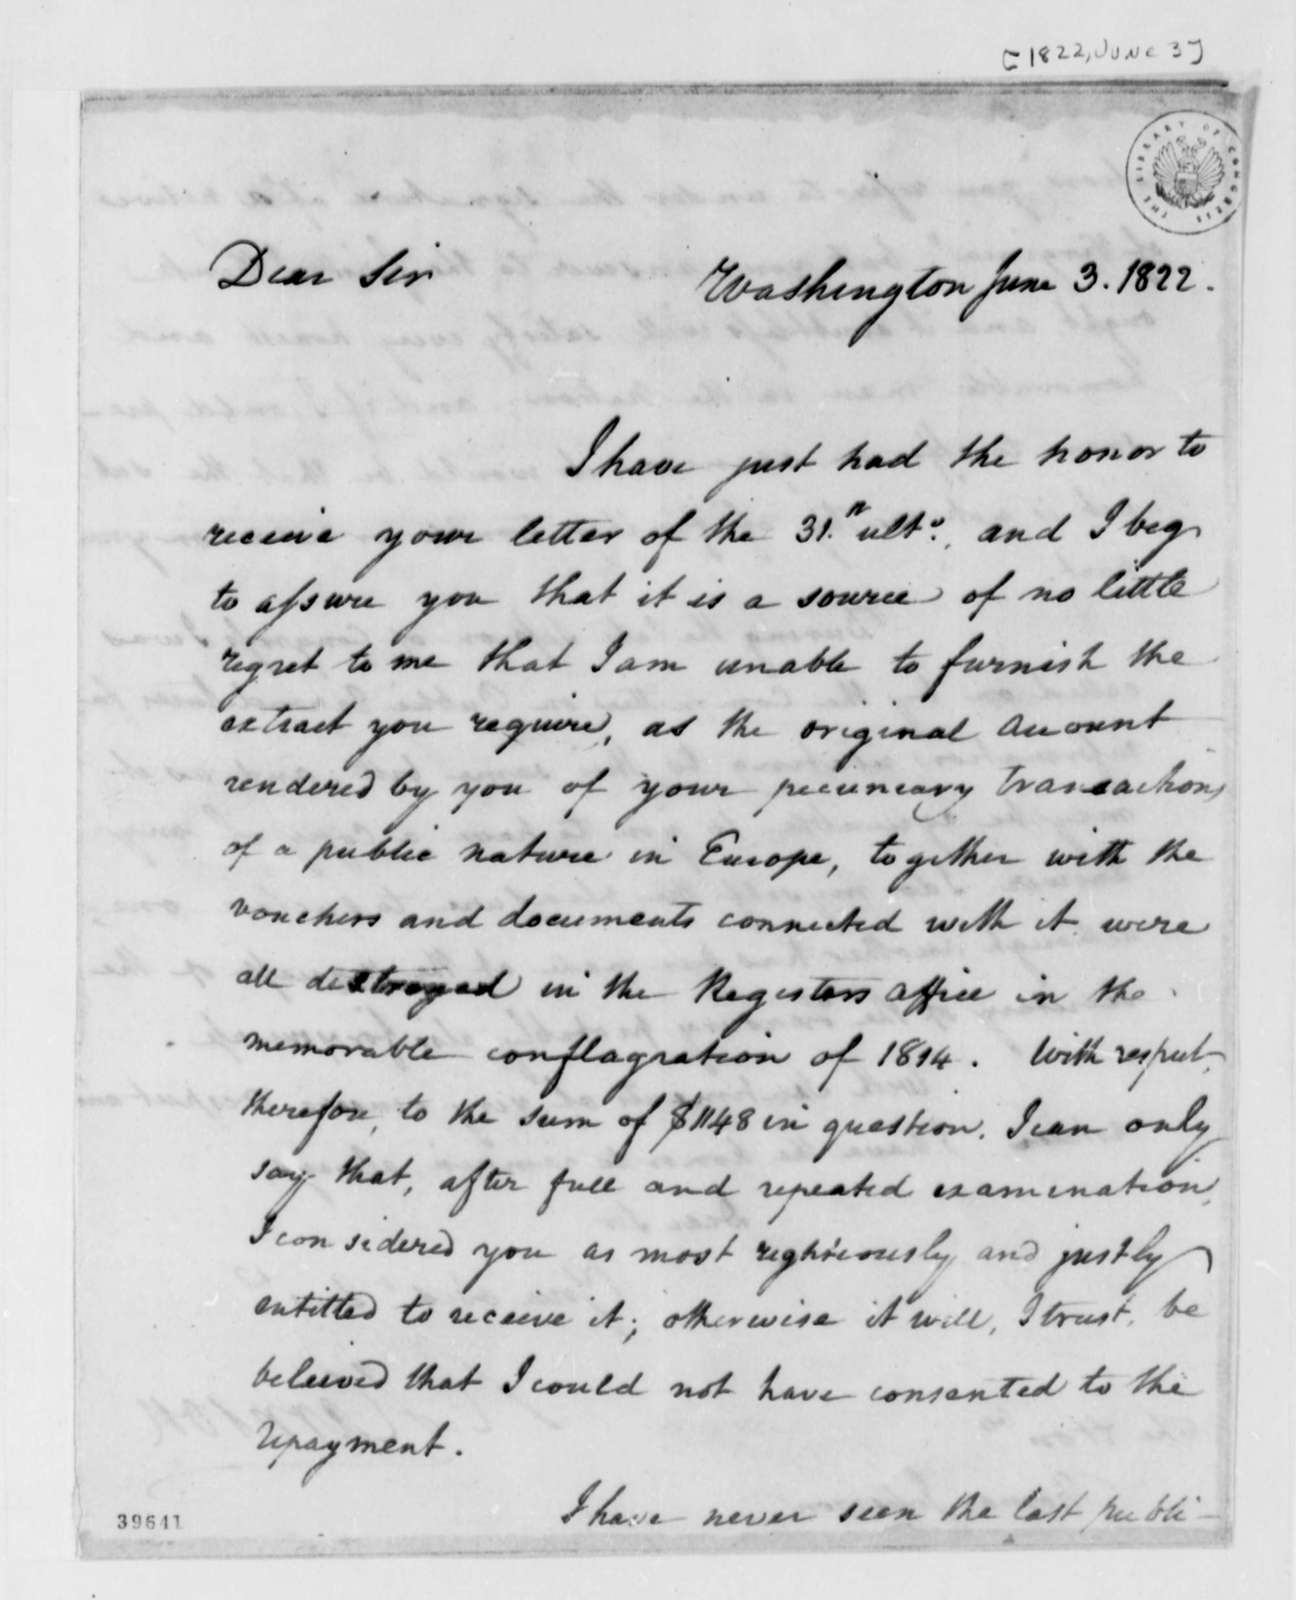 Richard Harrison to Thomas Jefferson, June 3, 1822